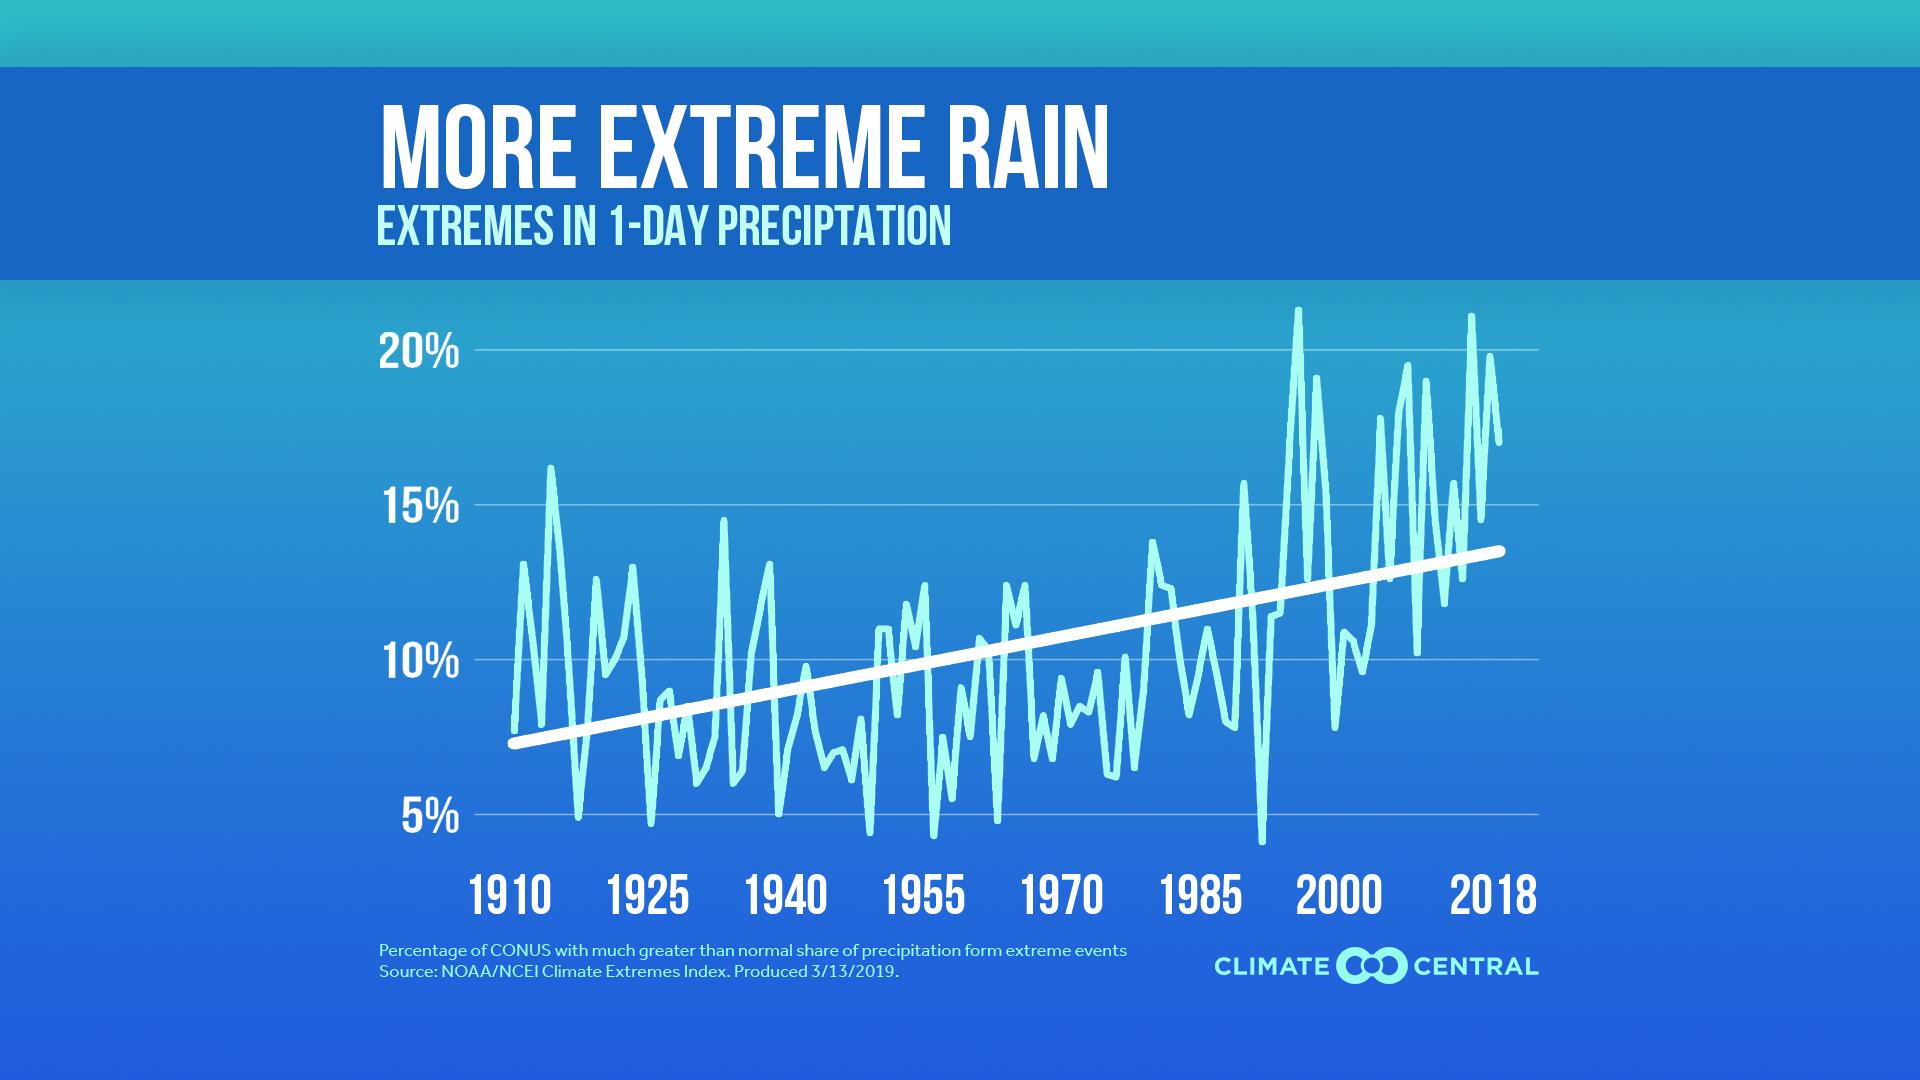 climate extremes index - precipitation